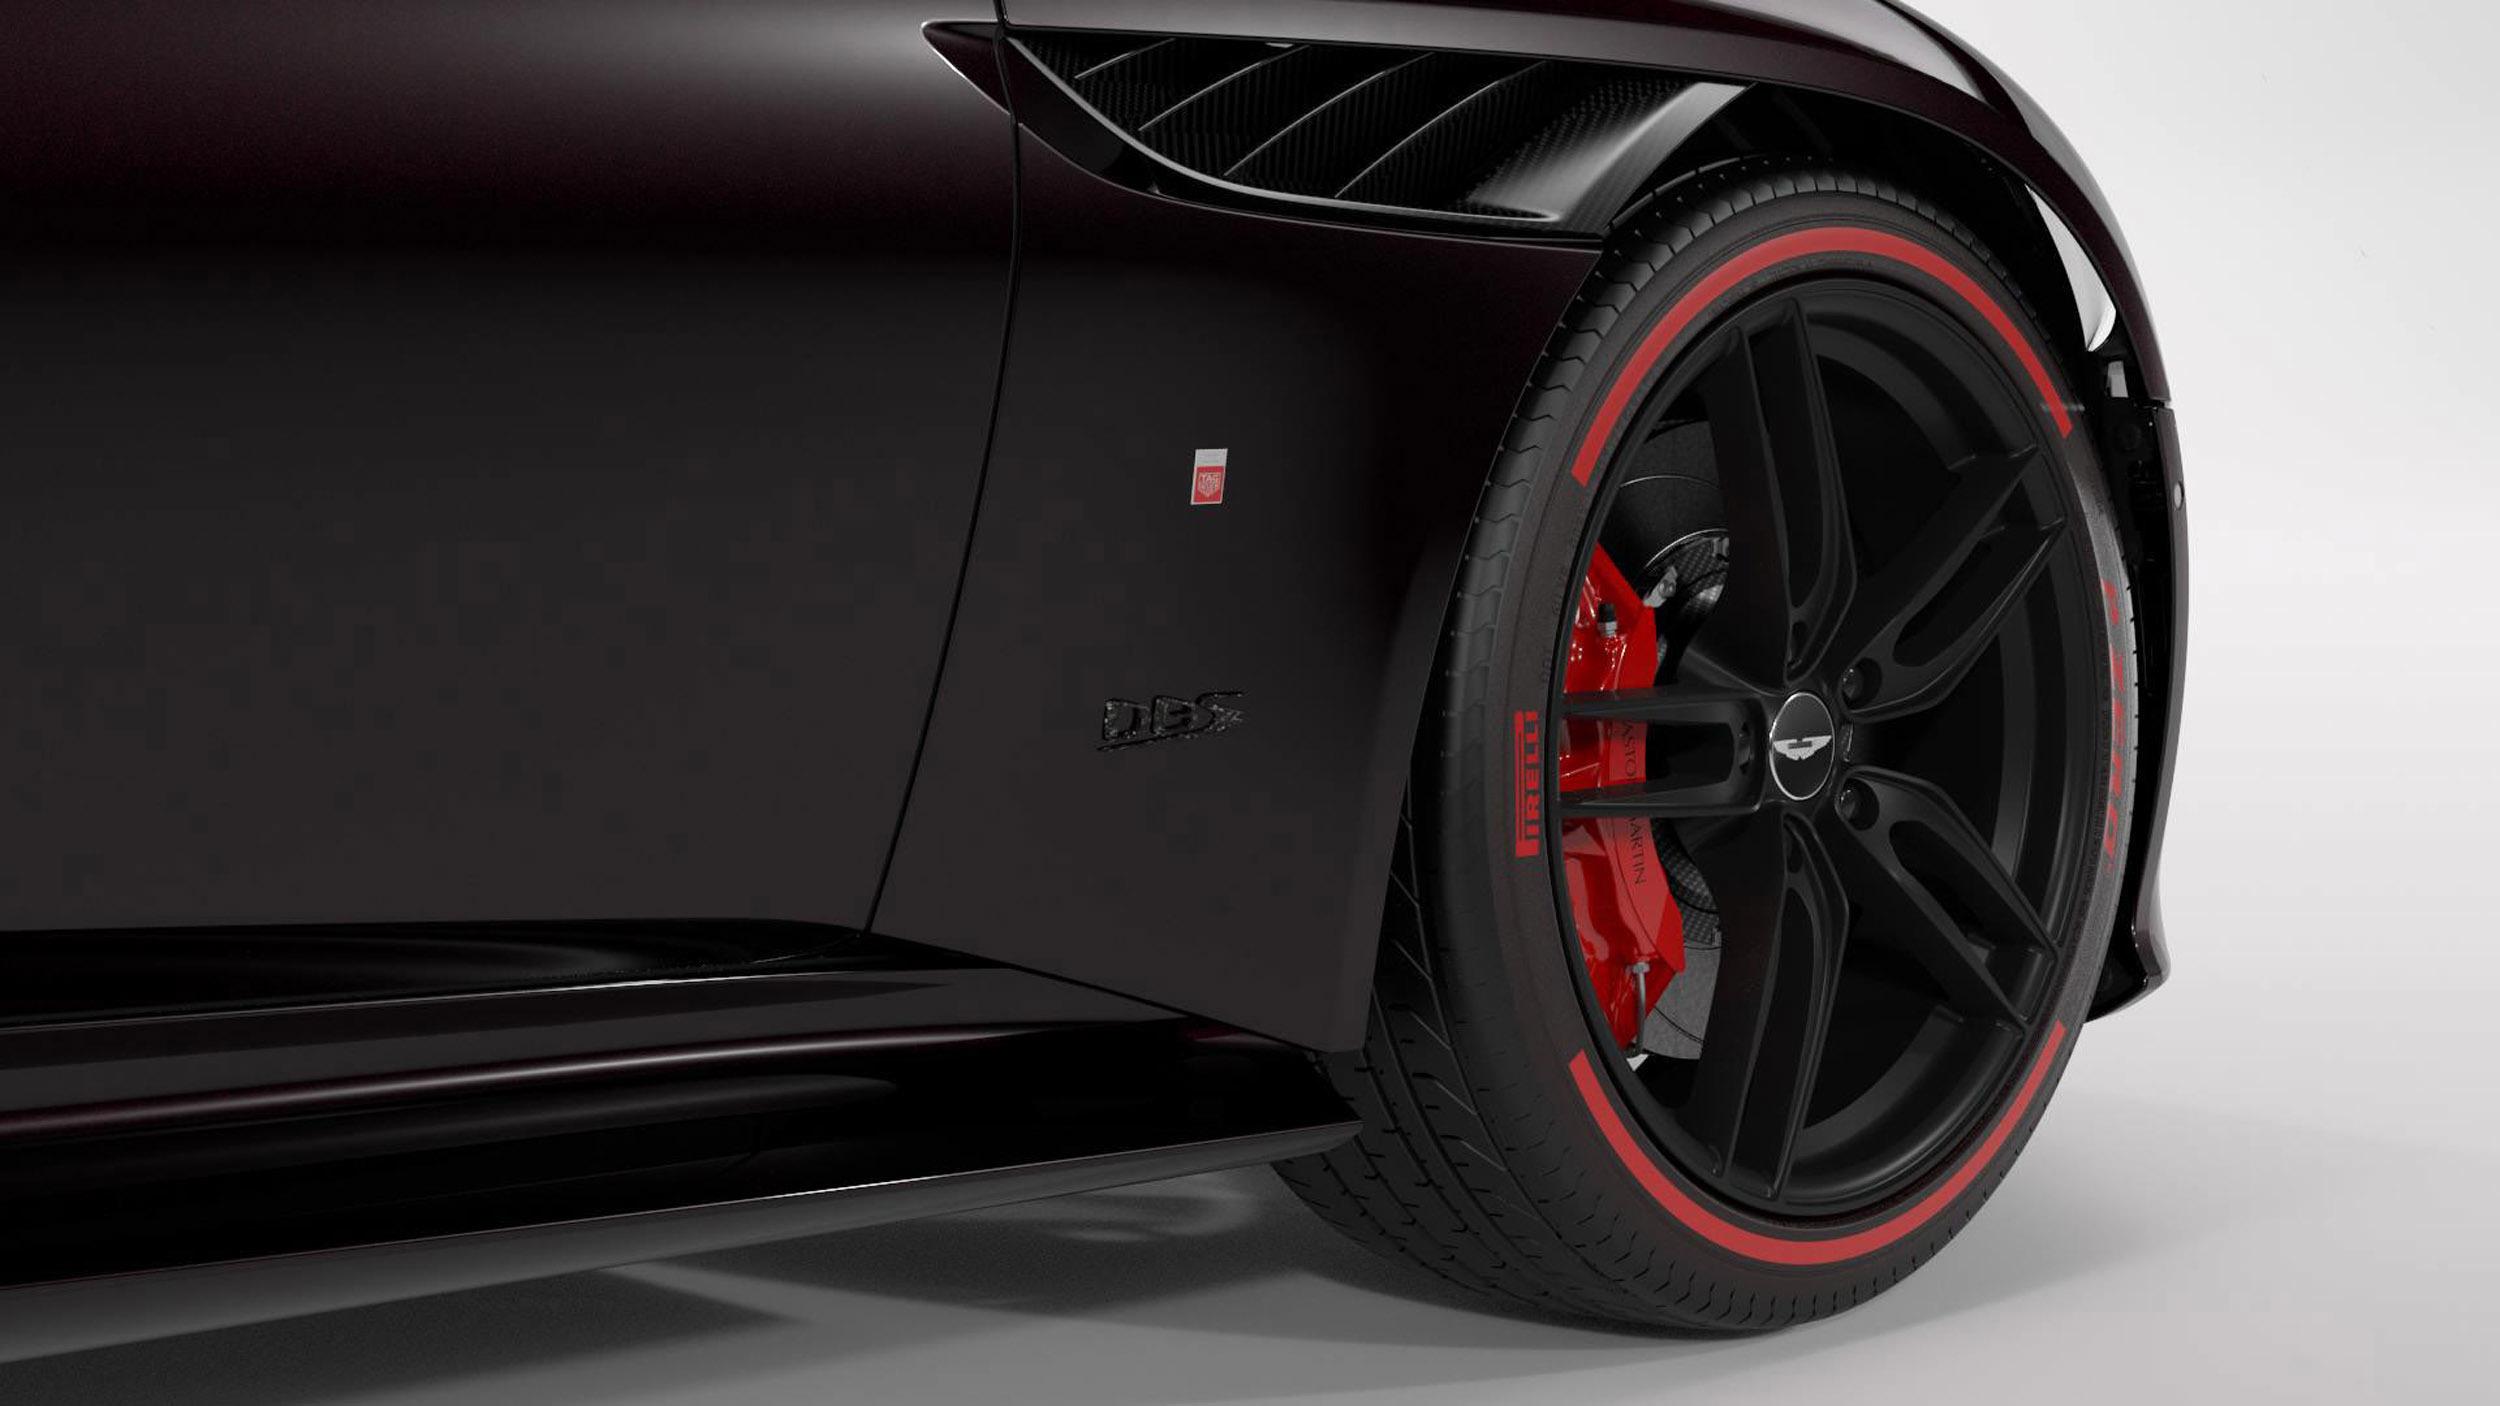 Aston Martin DBS Superleggera Tag Heuer Edition (3)